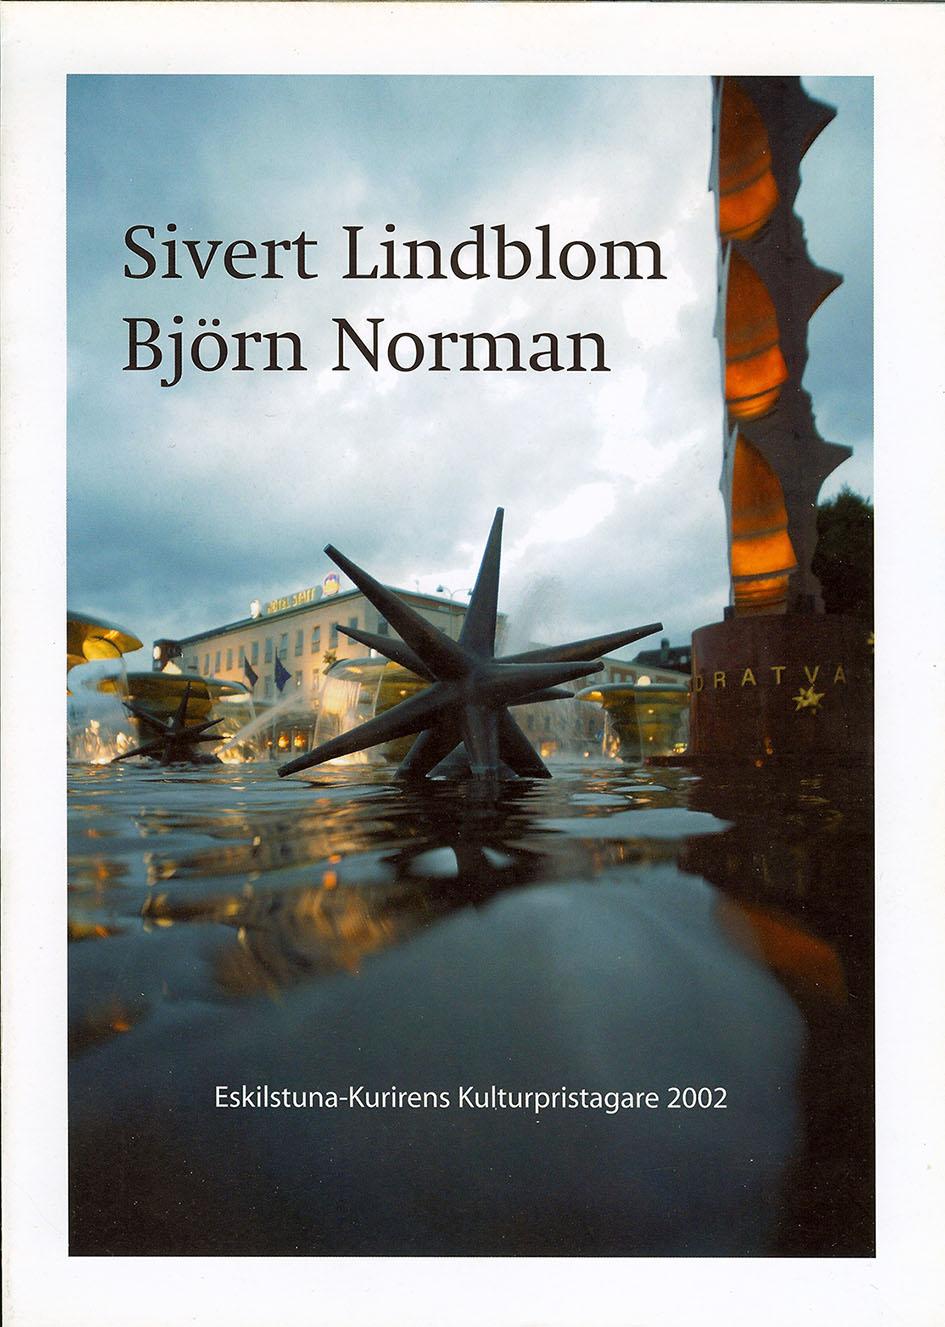 Sivert Lindblom Eskilstuna Kuriren Kulturpris 1-